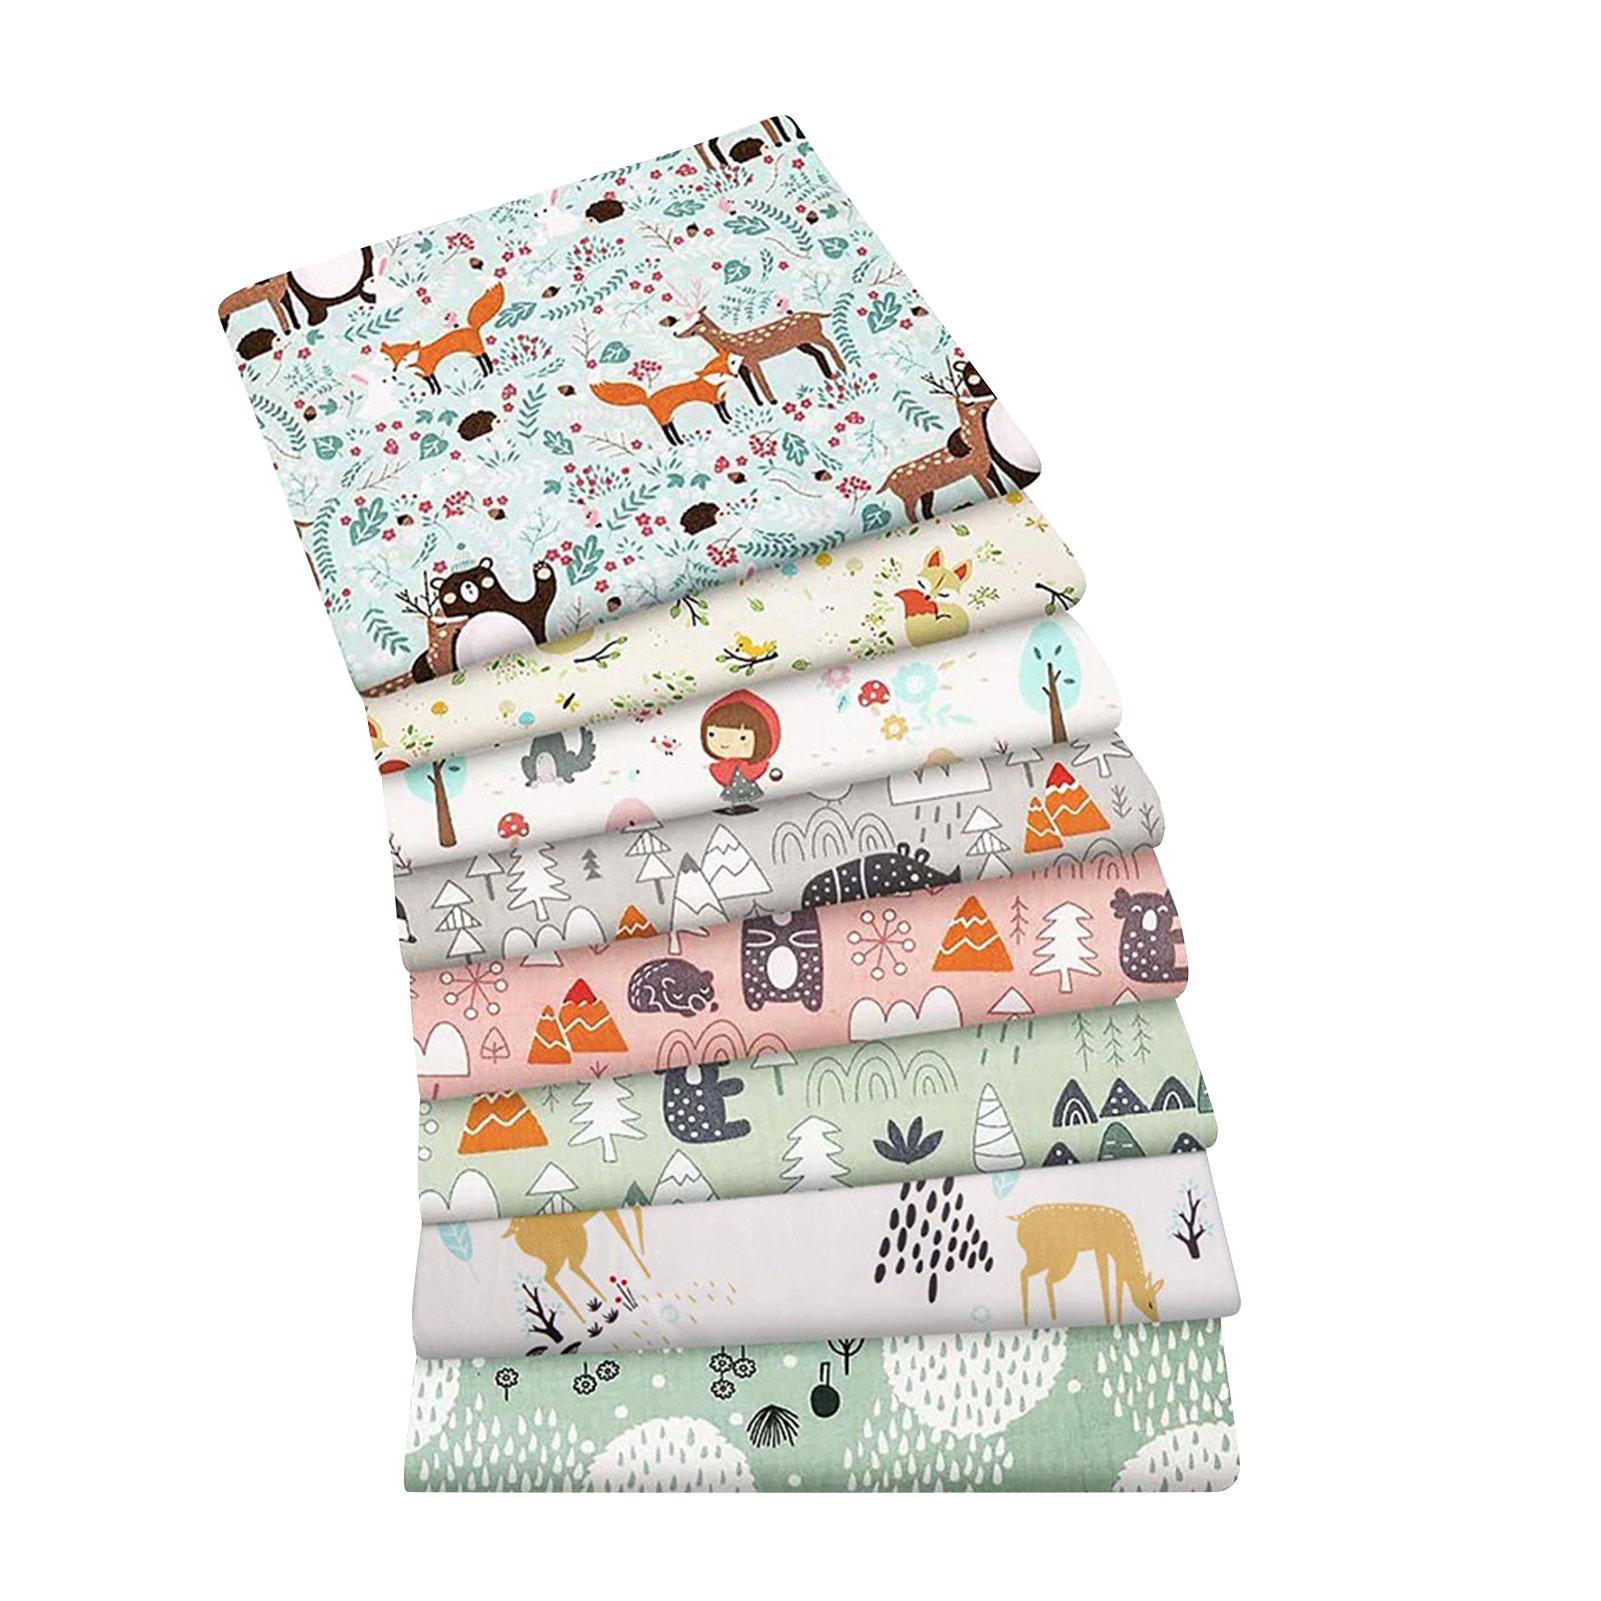 8PCS Cartoon Tiere Gedruckt Baumwolle Tuch Hause Textil Patches Kleid Nähen Material DIY Pures Handwerk Liefert